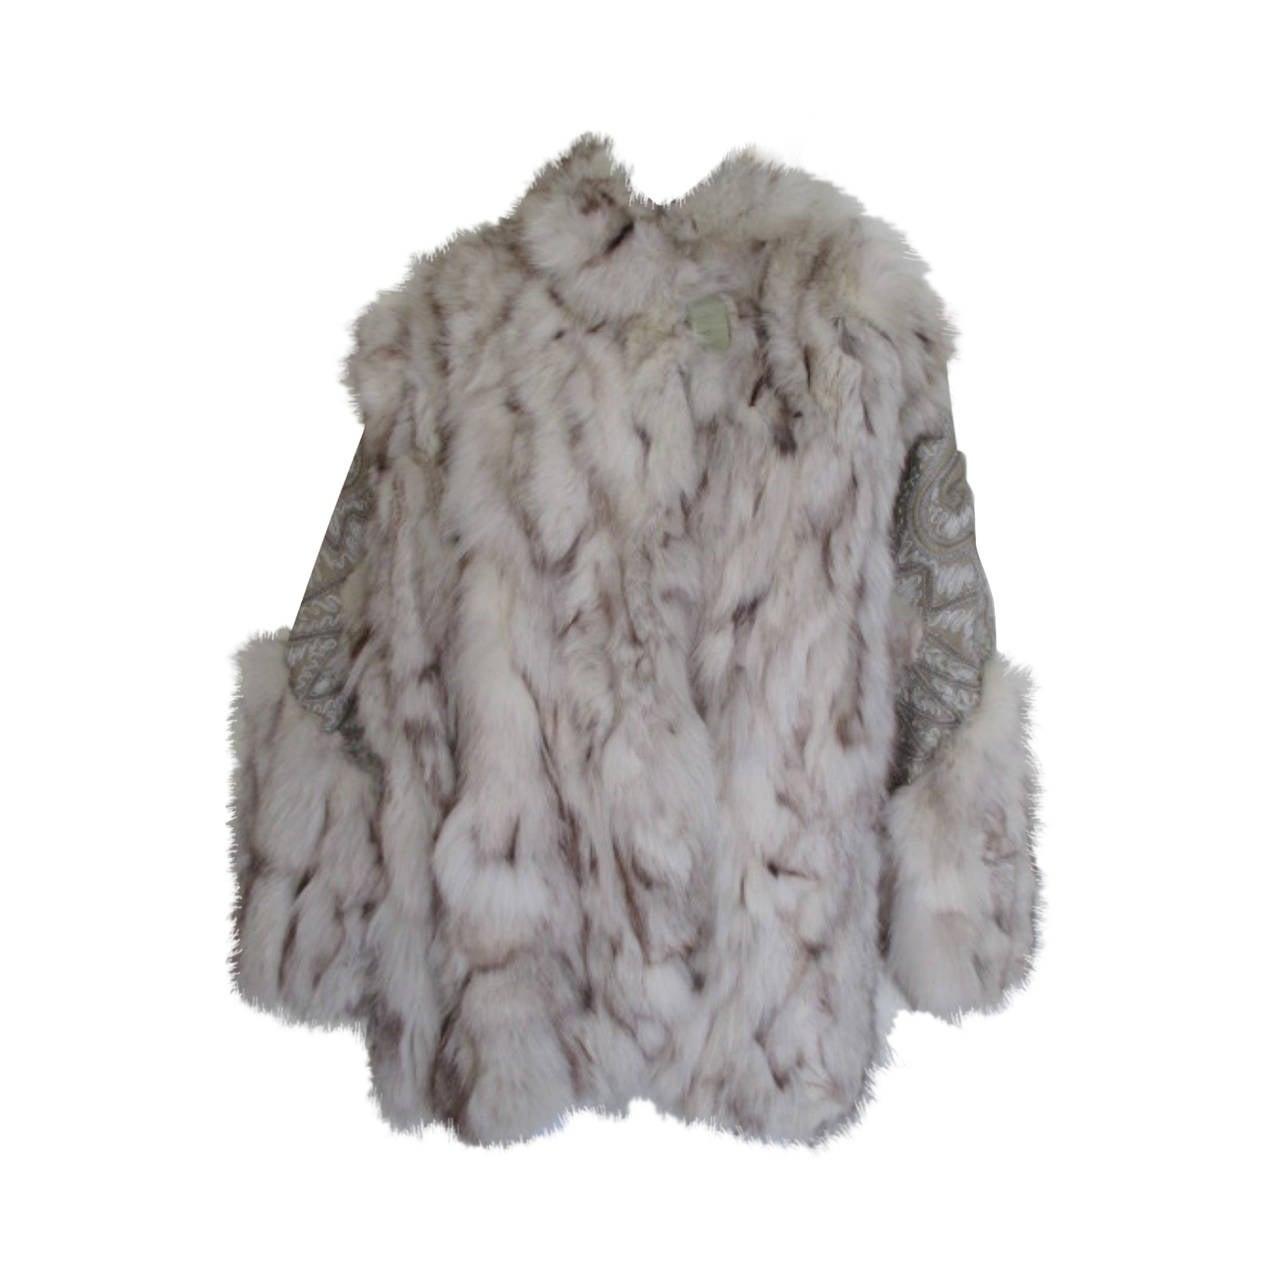 e4a8ea56 Arianna Firenze Apres-ski Fox fur jacket with embroidered leather